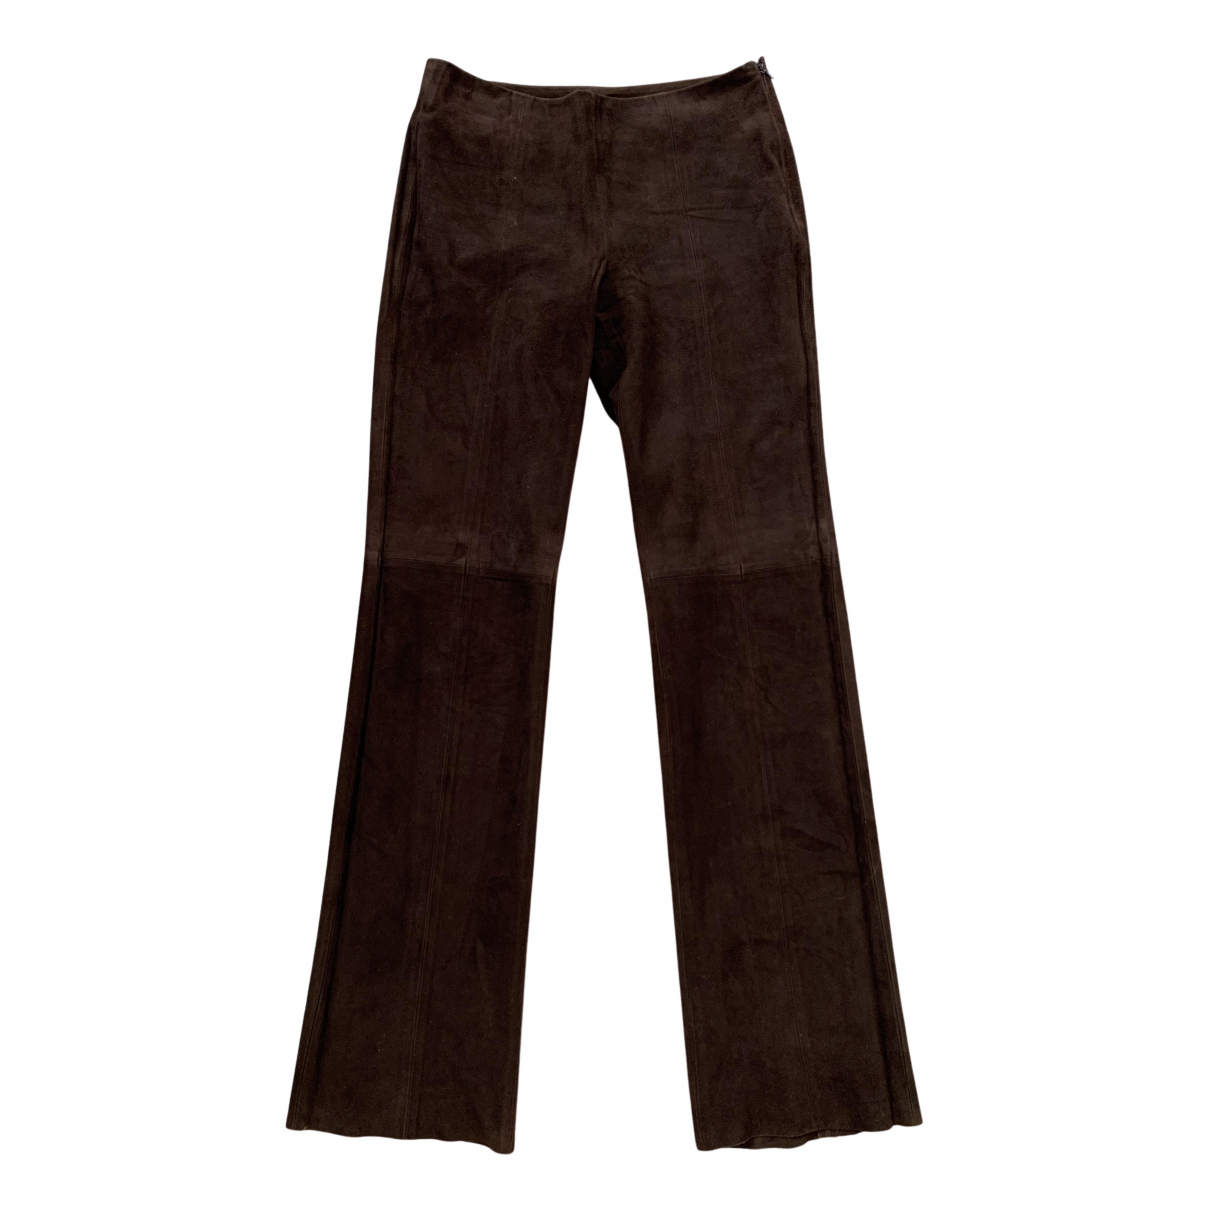 Valentino Garavani N Brown Suede Trousers for Women 6 US